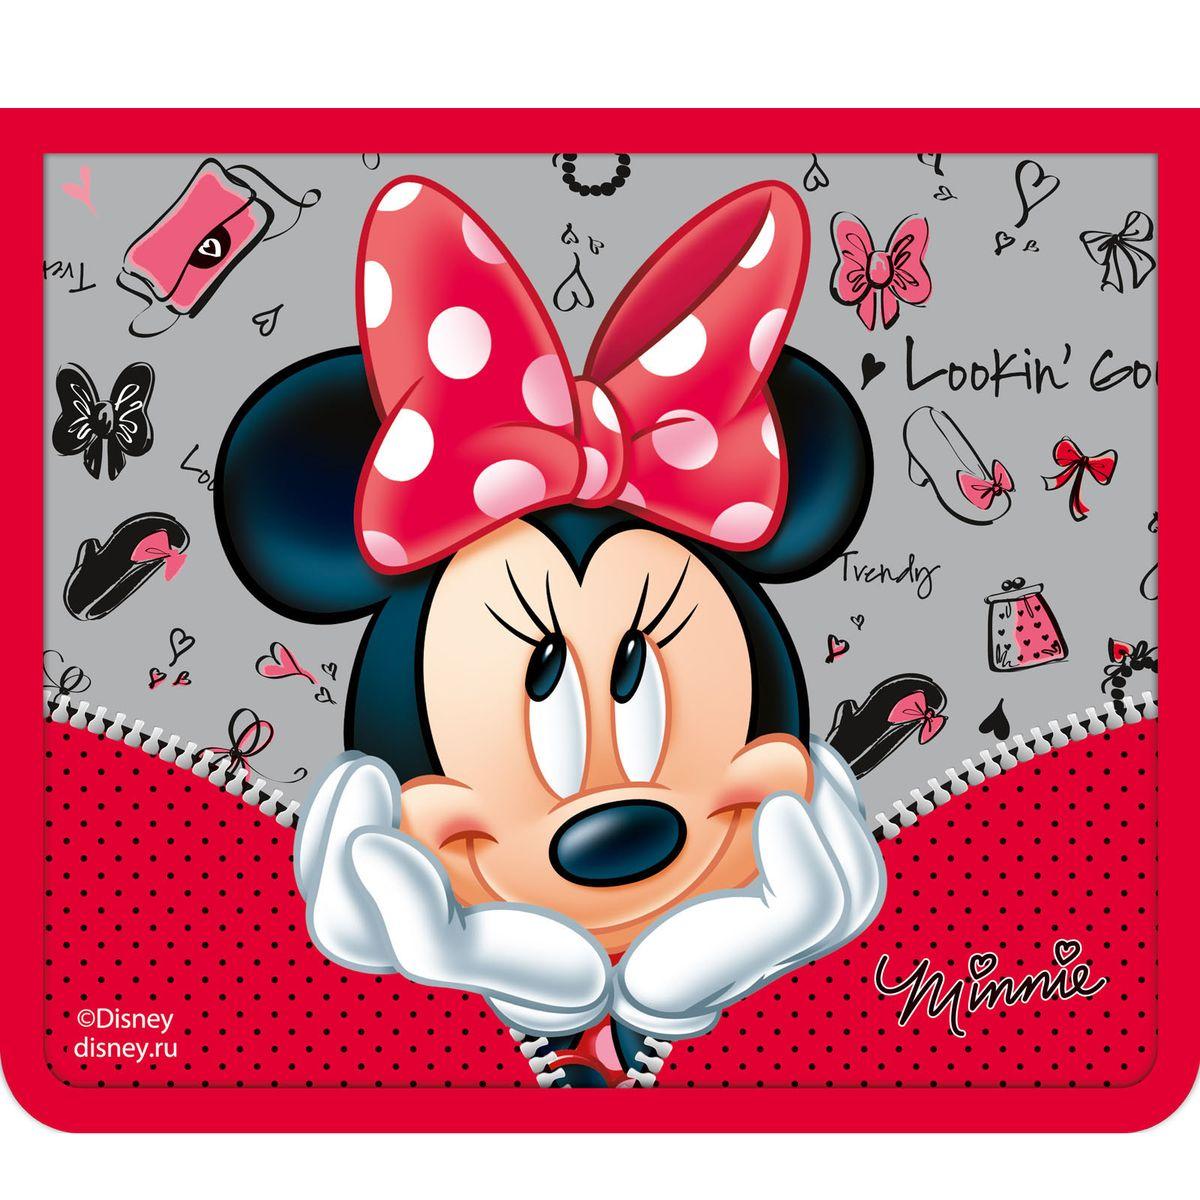 Disney Папка для тетрадей Минни формат А5 на молнии